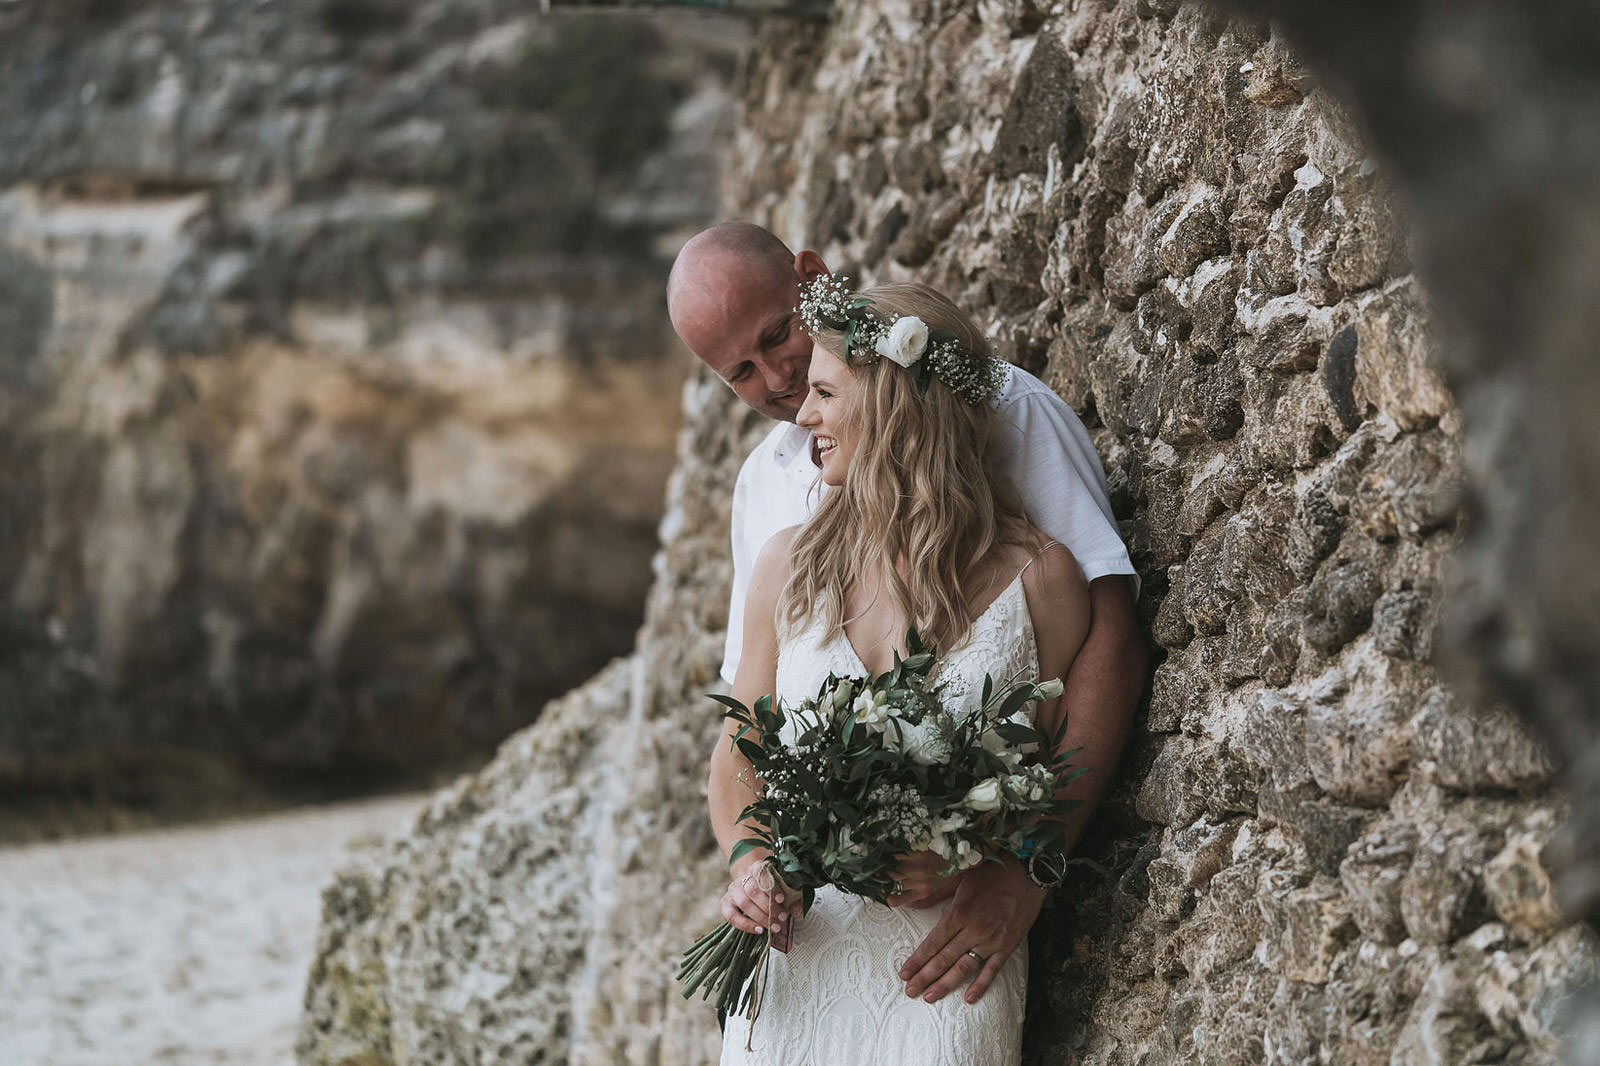 newfound-hai-tide-nusa-lembongan-bali-wedding-photographers-138